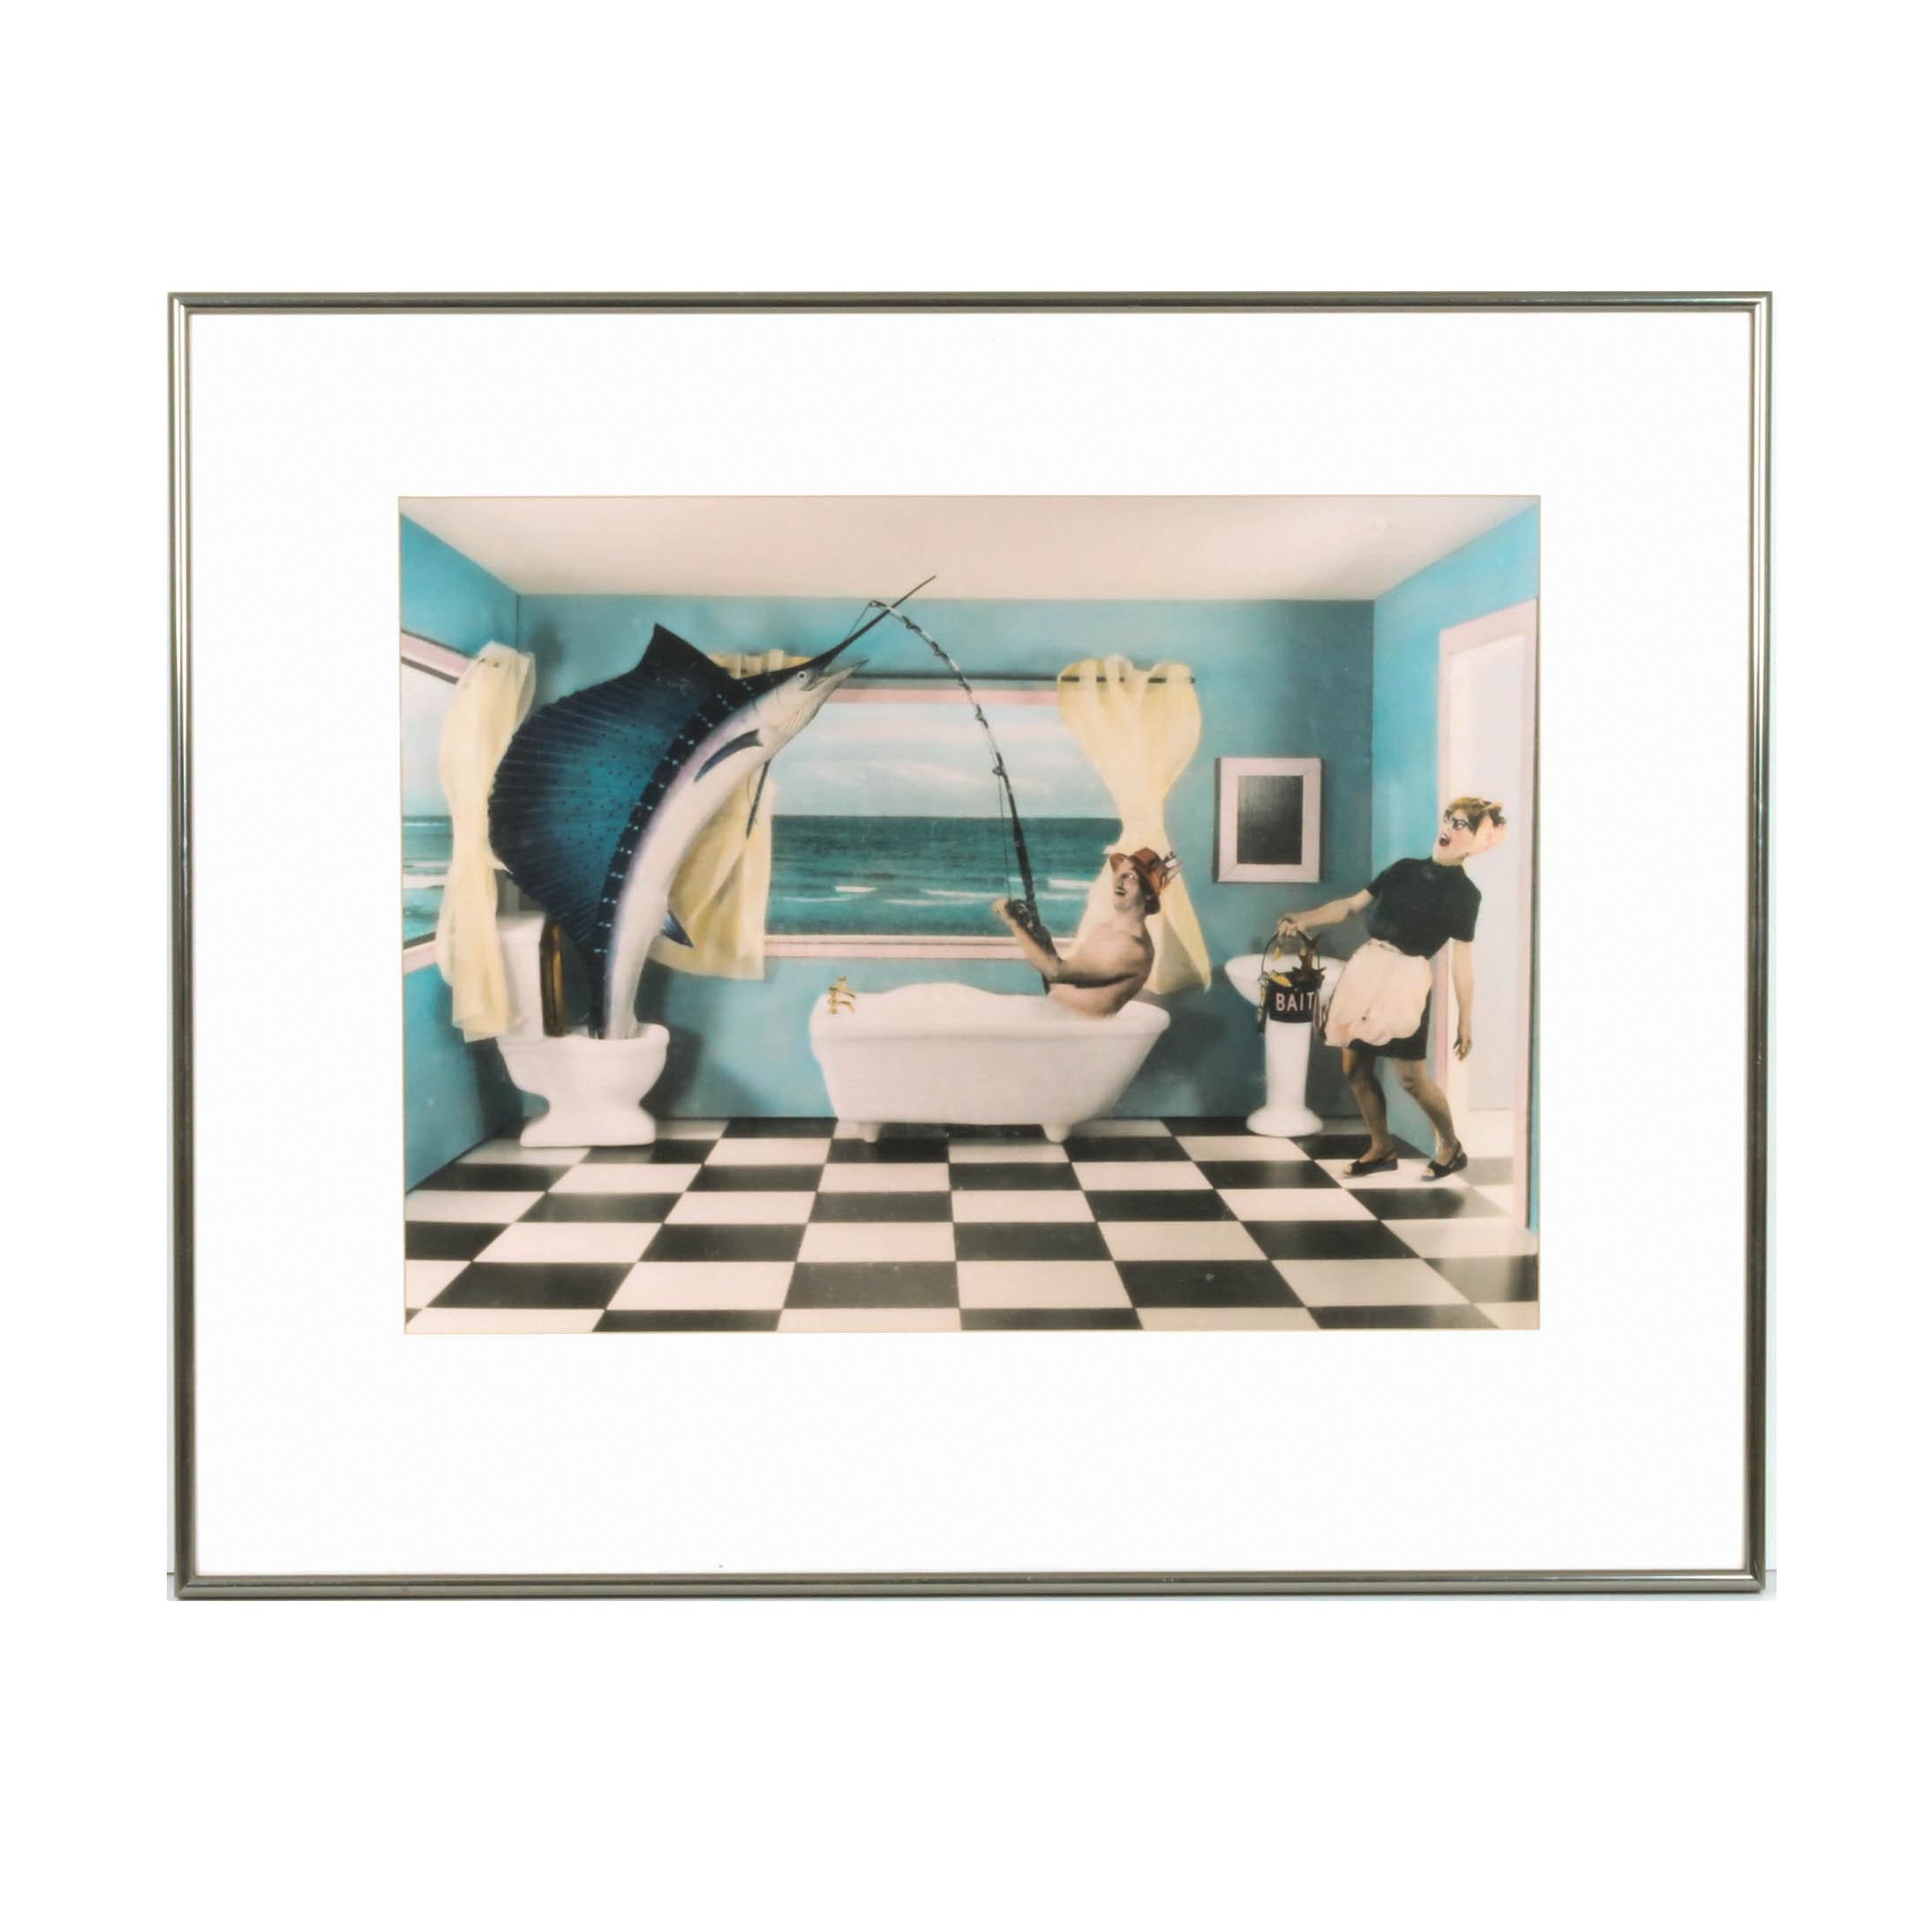 "Michael Combs Photographic Print ""Bathtub Fisherman"""